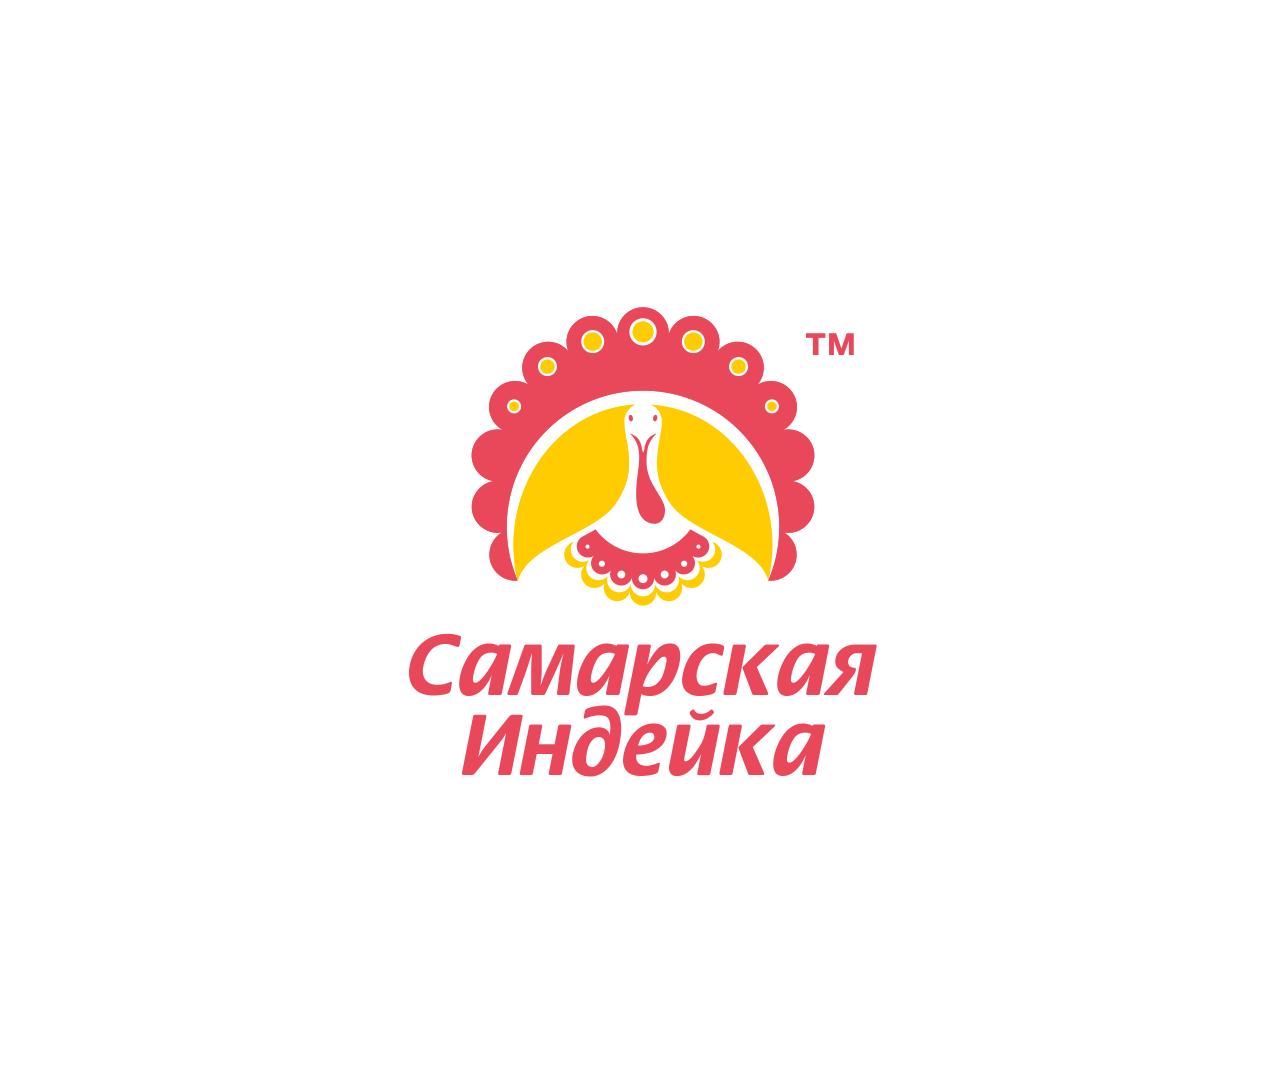 Создание логотипа Сельхоз производителя фото f_08855e01facd4299.png